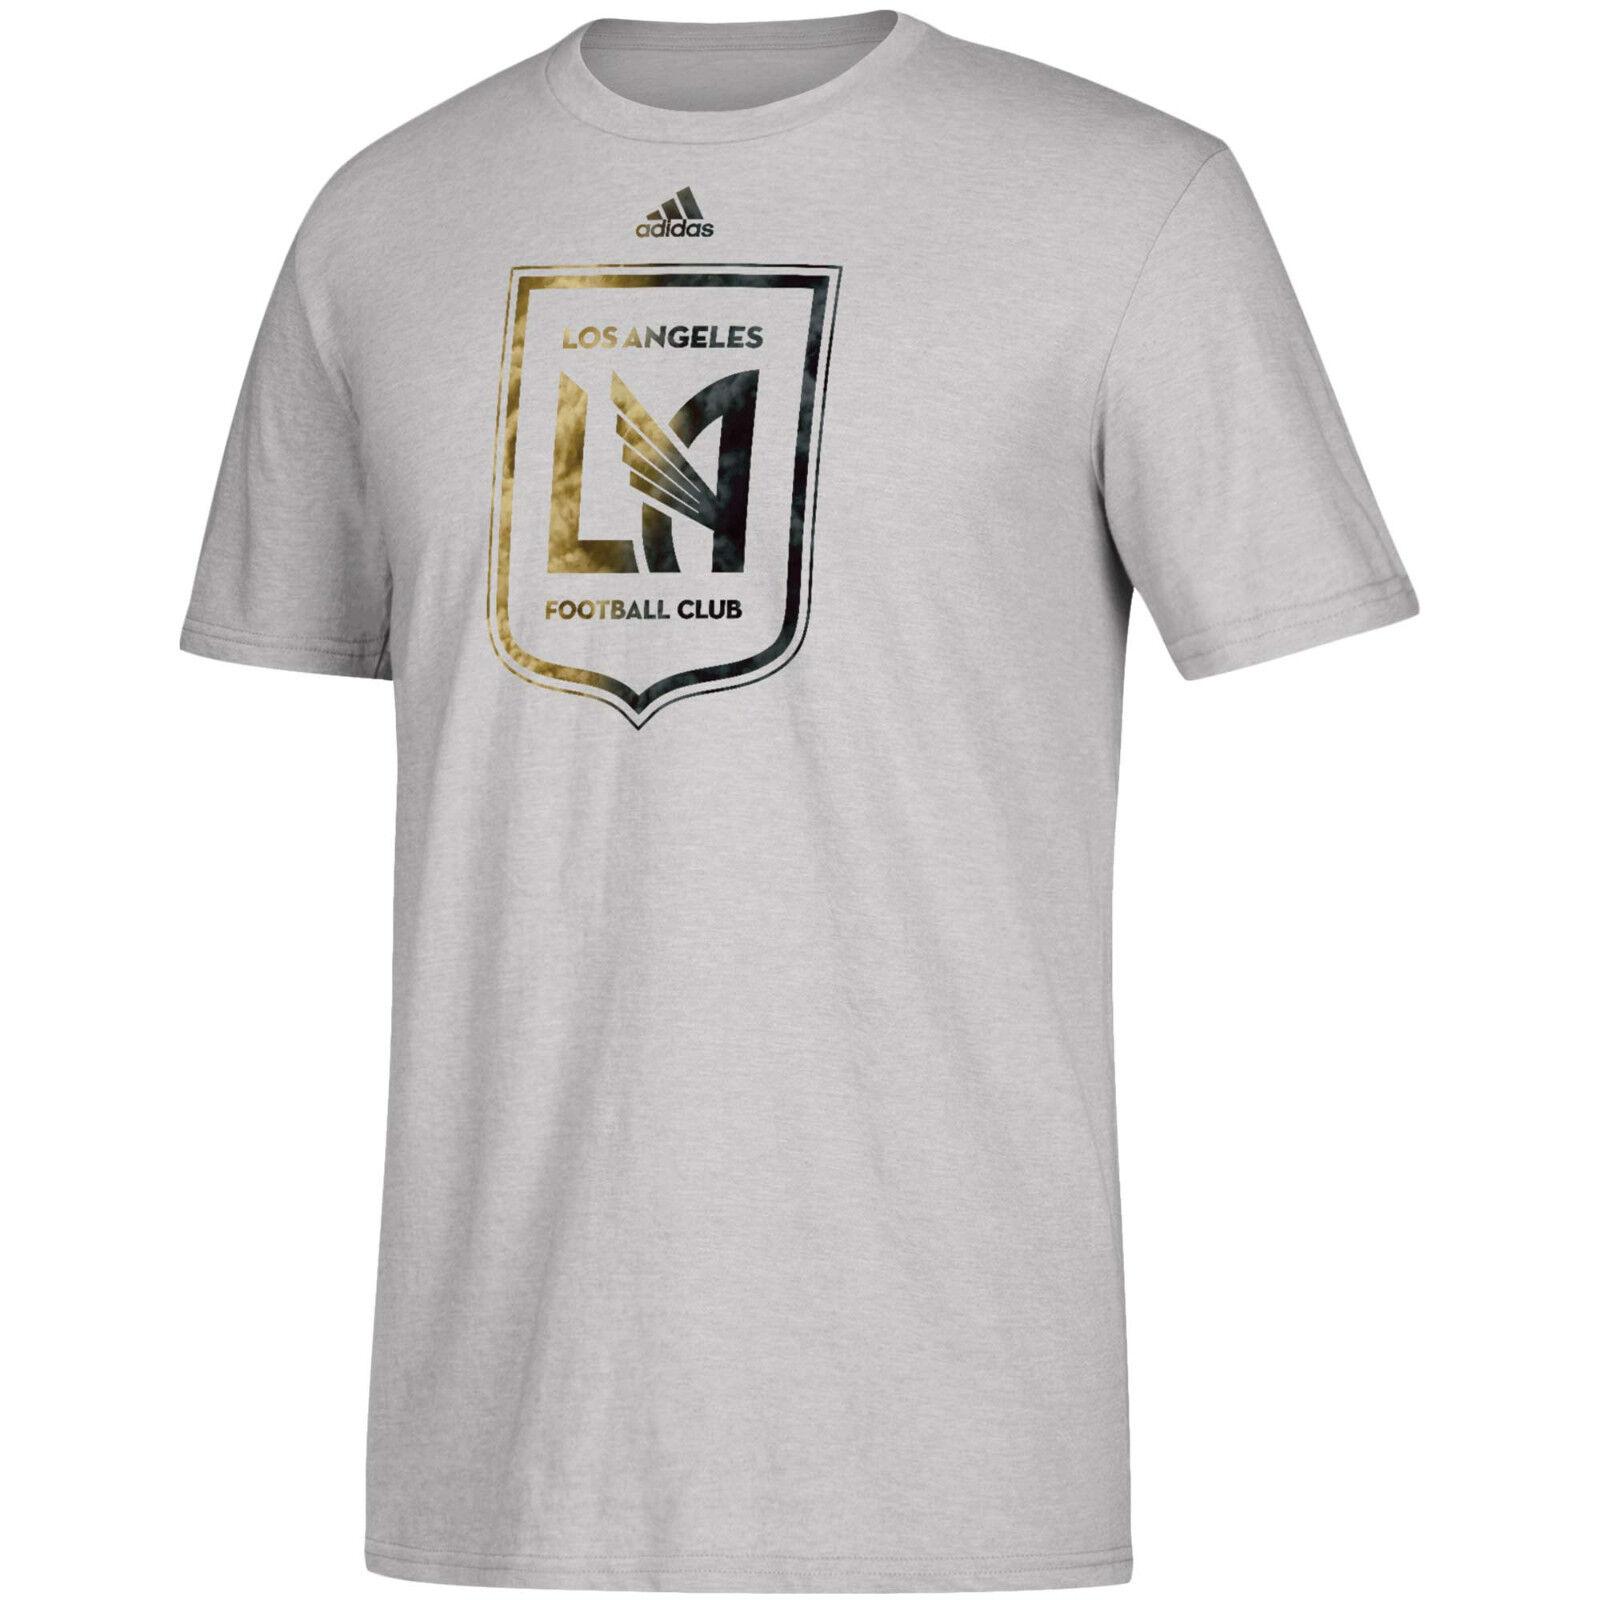 6bb05fec5c9 Adidas Los Angeles FC LAFC MLS 2018 Soccer Team Crest Reflect Foil Shirt  White